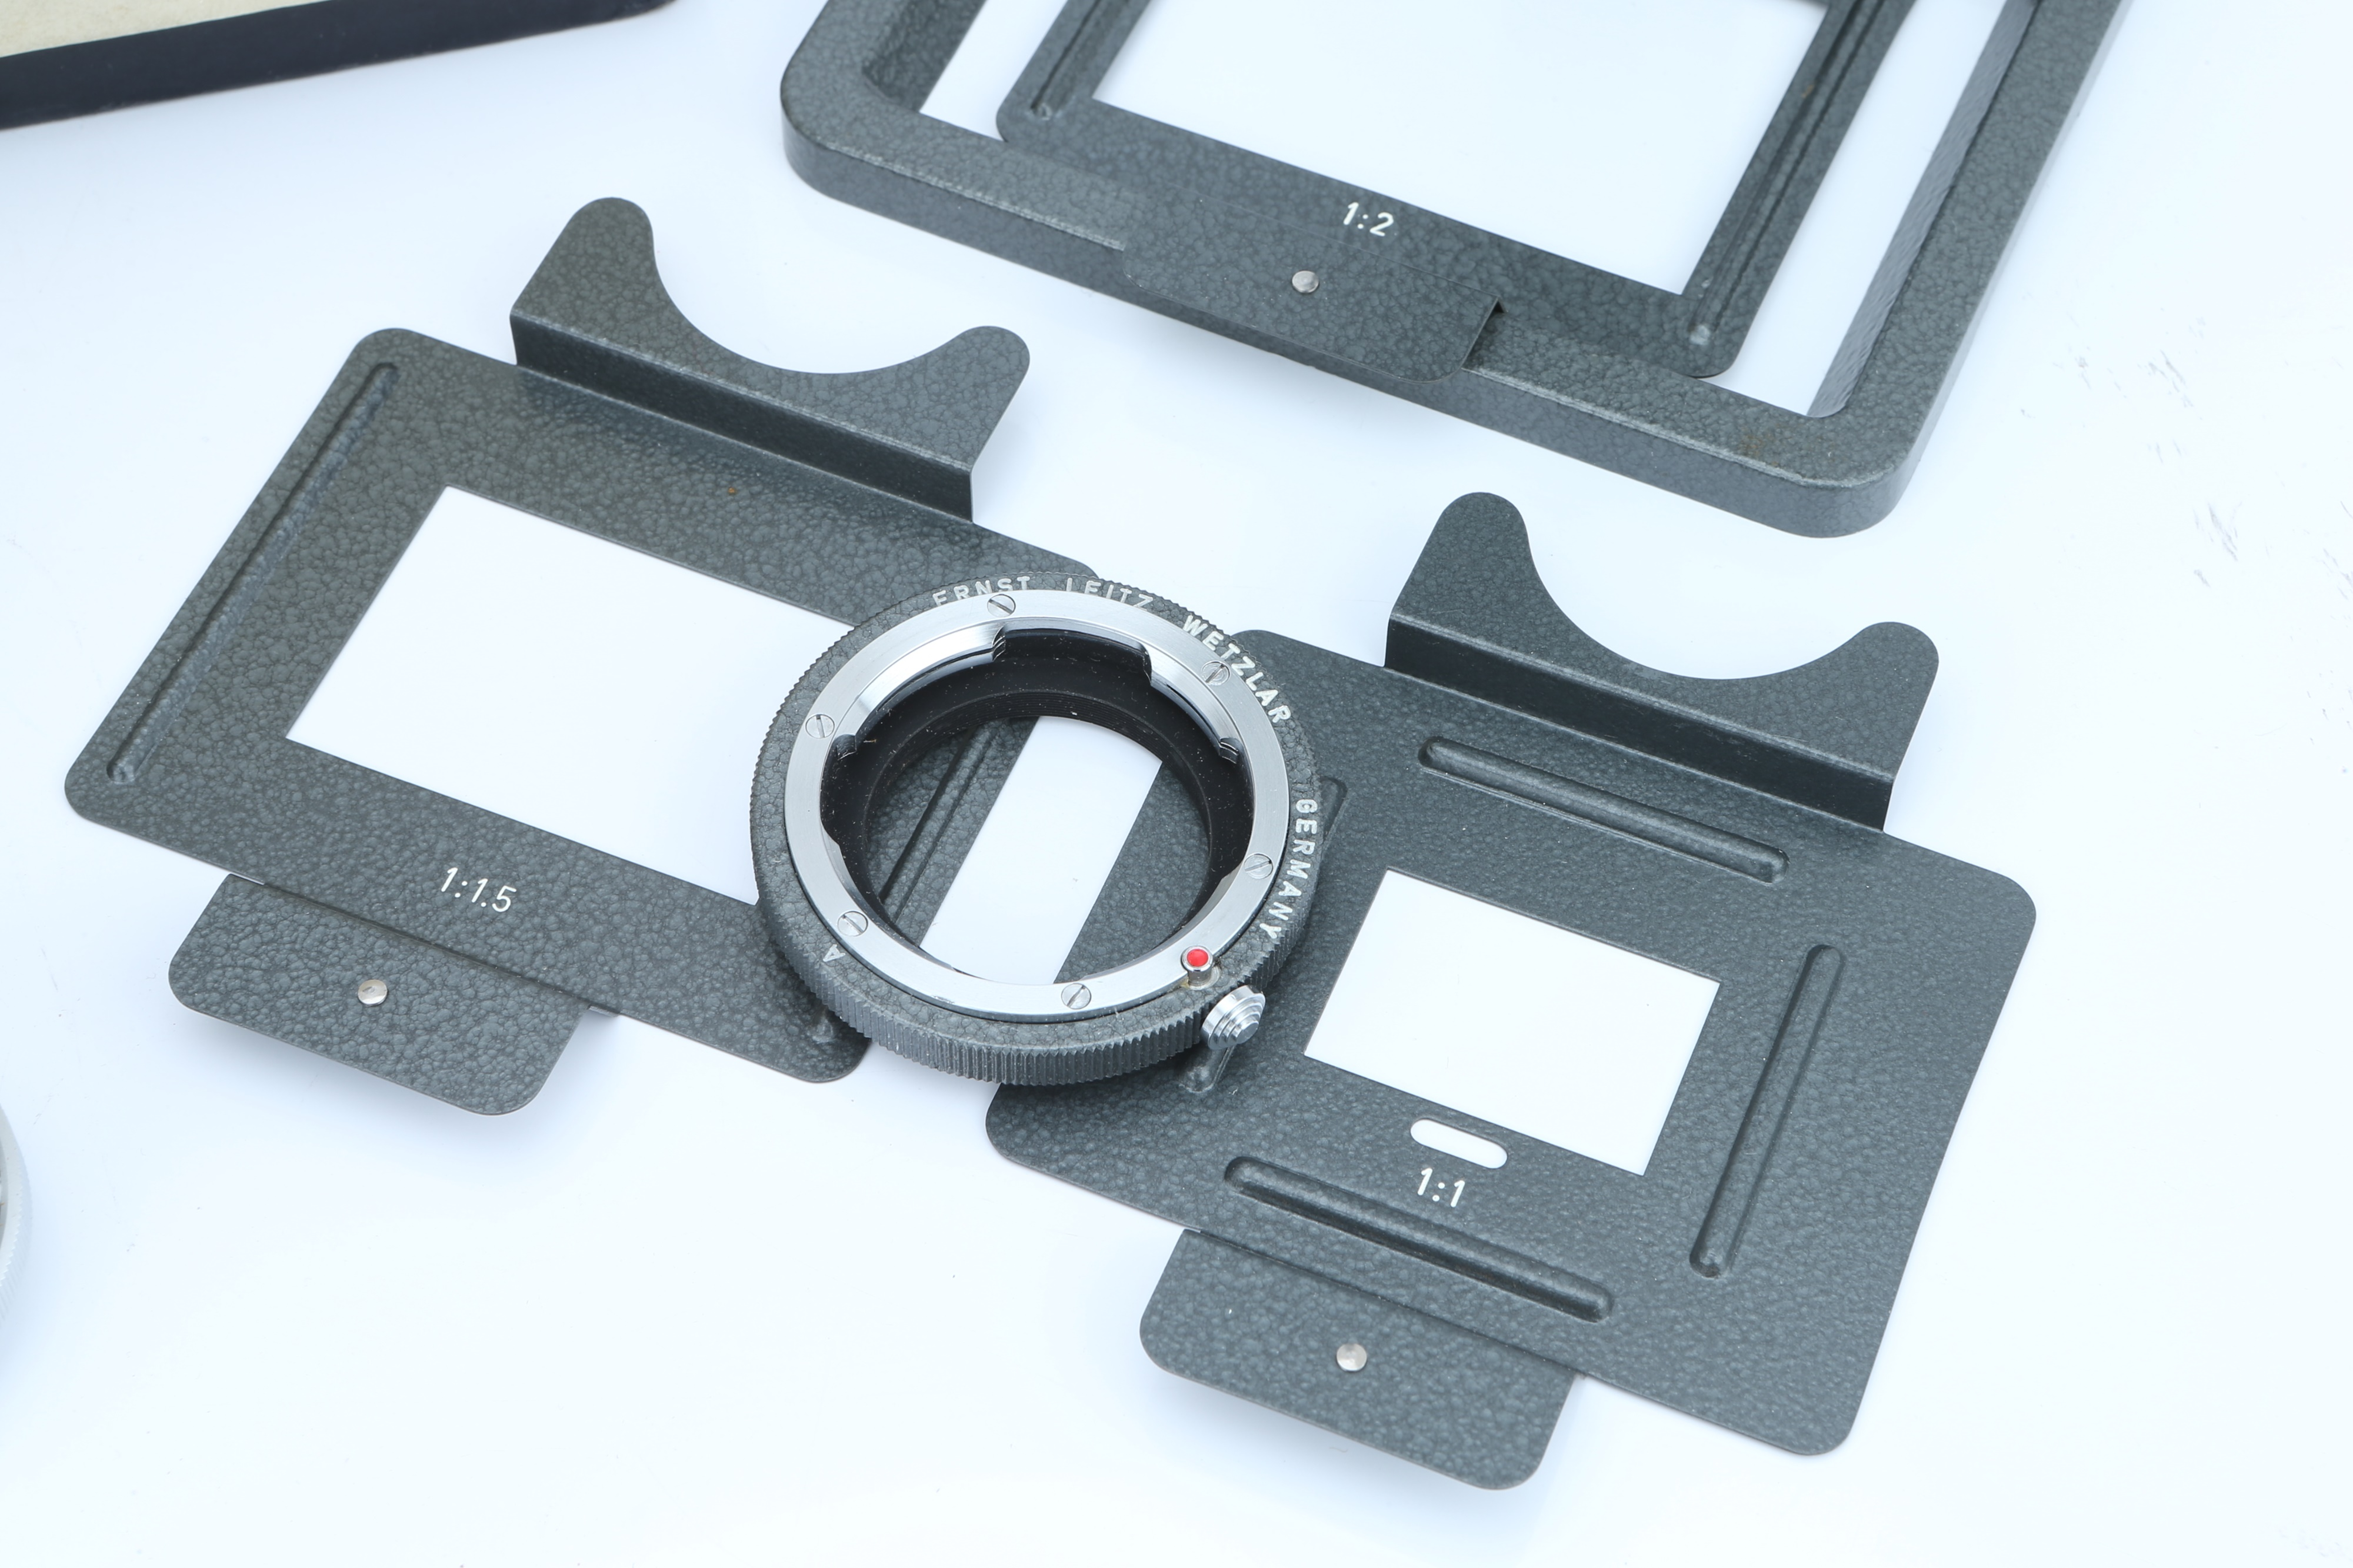 A Selection of Leica Visoflex Equipment, - Image 4 of 4